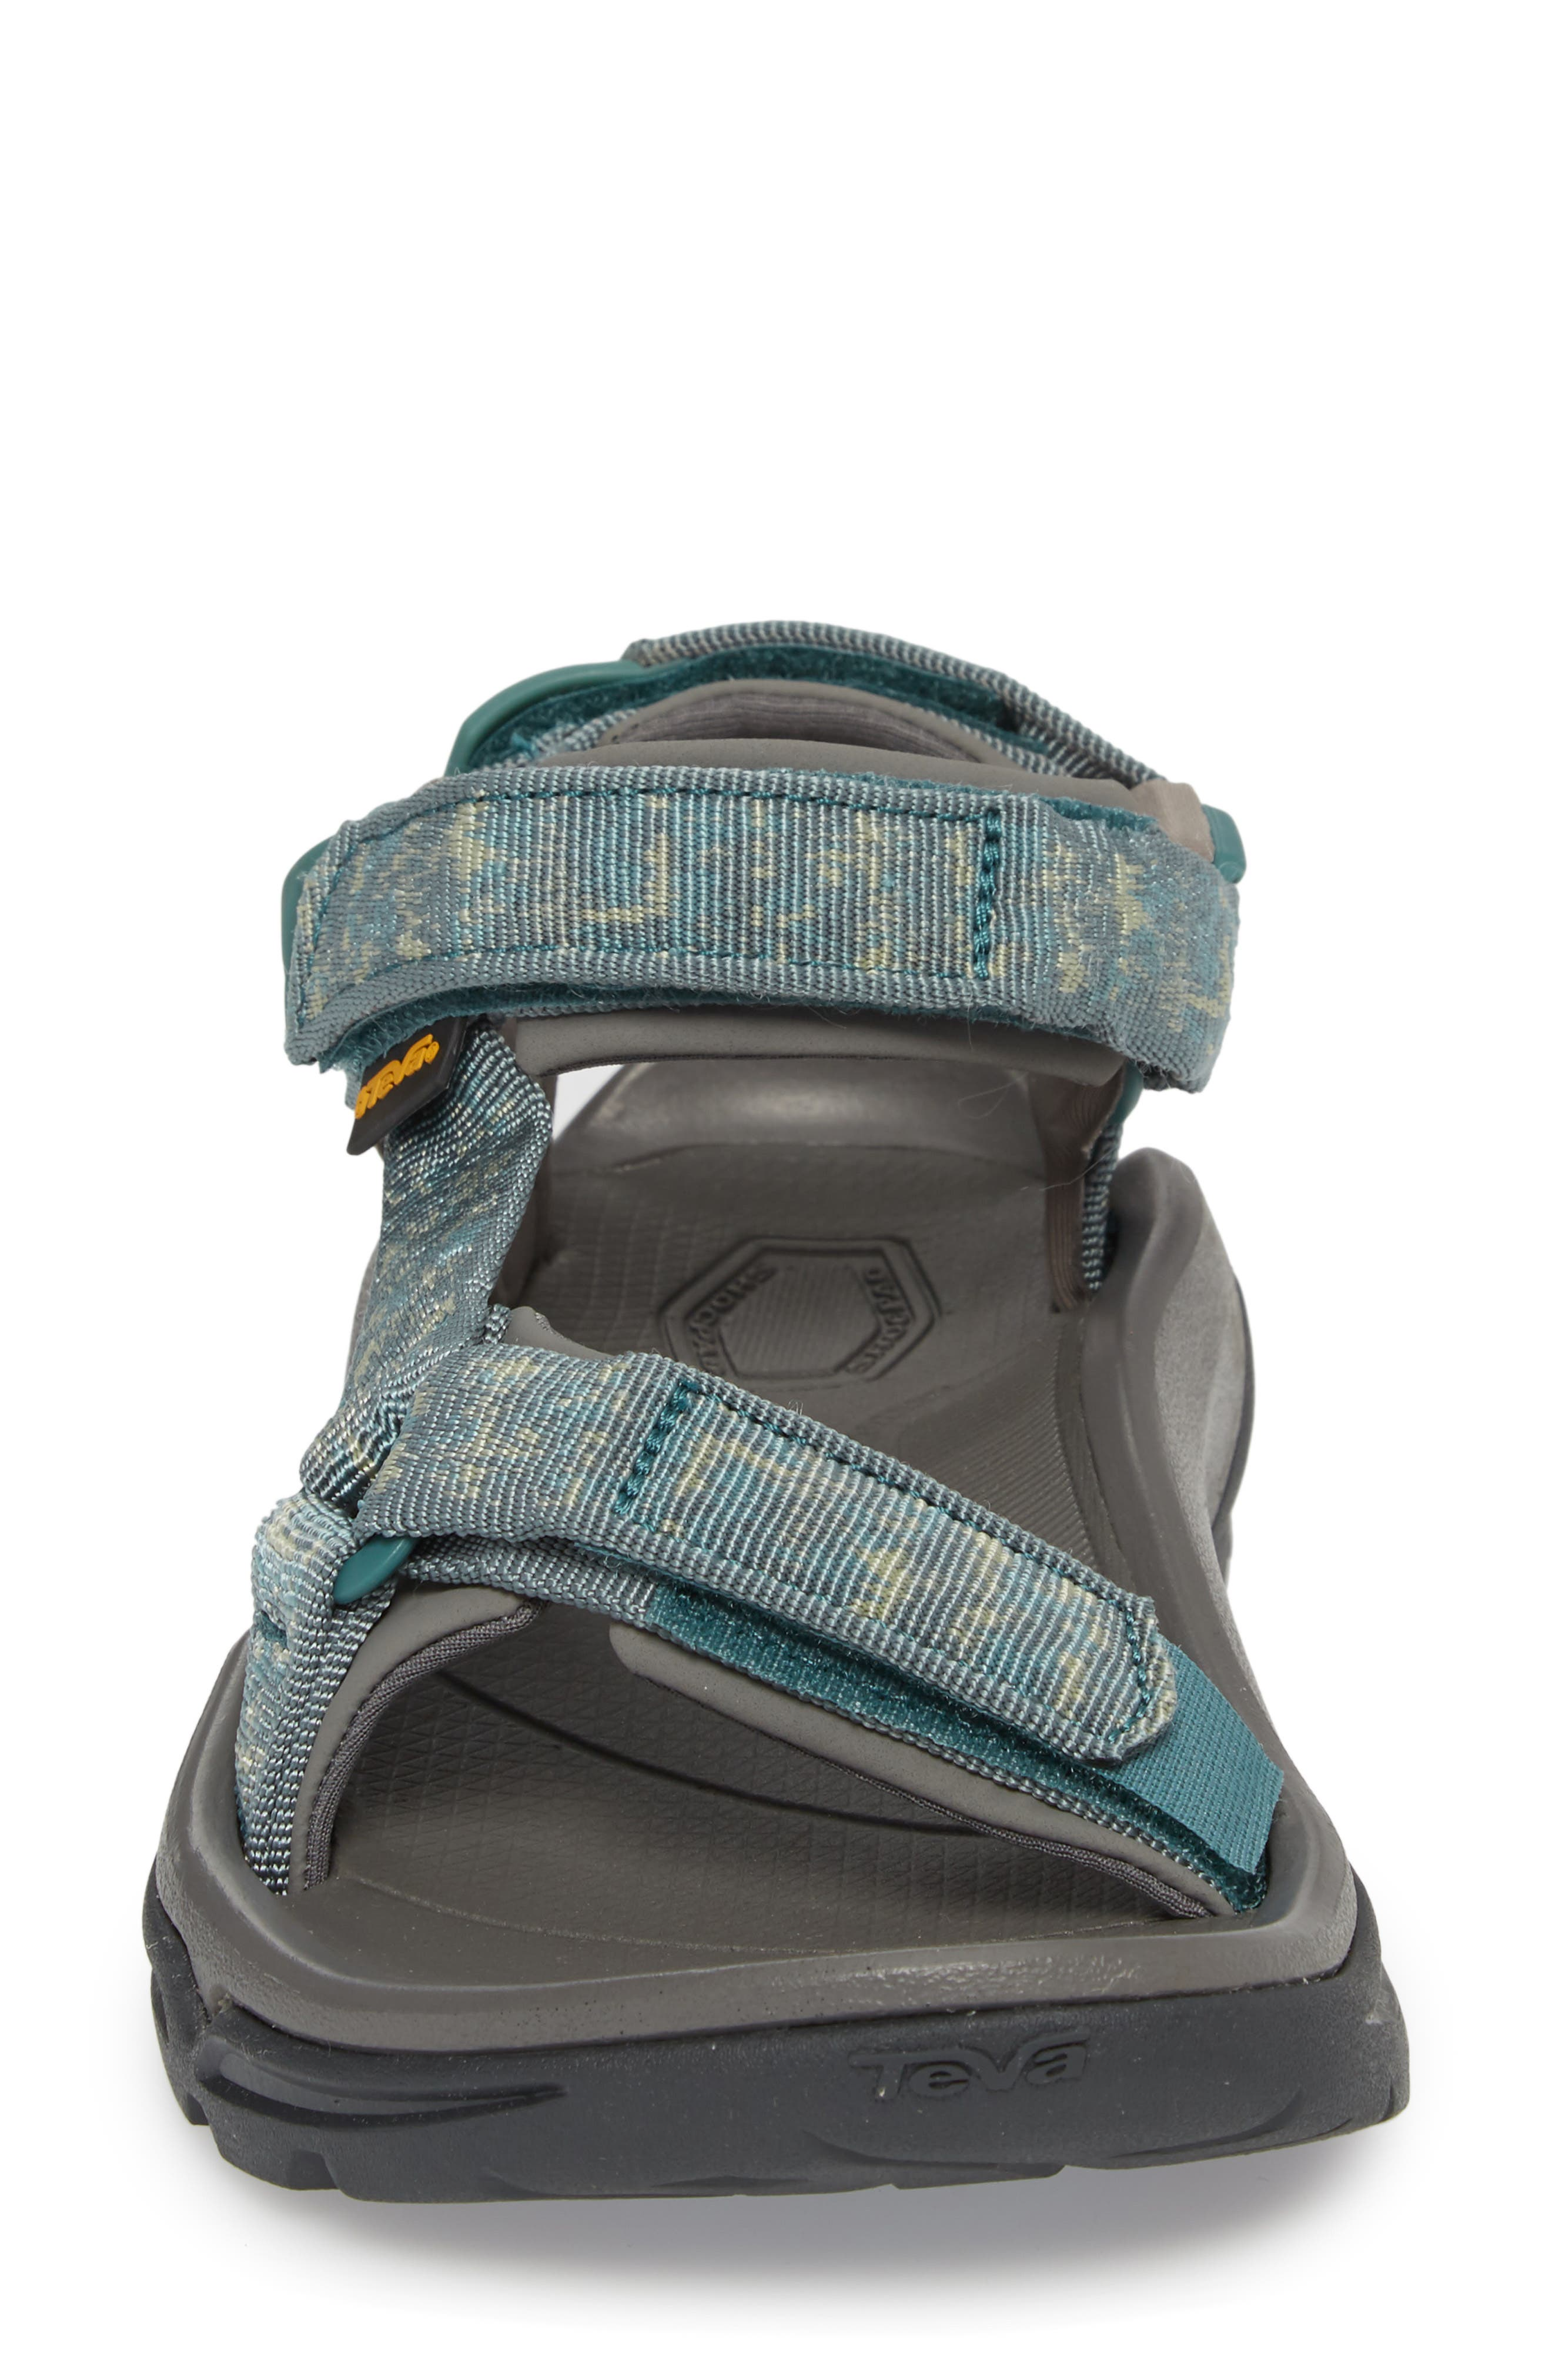 Terra FI 4 Sport Sandal,                             Alternate thumbnail 4, color,                             Rocio North Atlantic